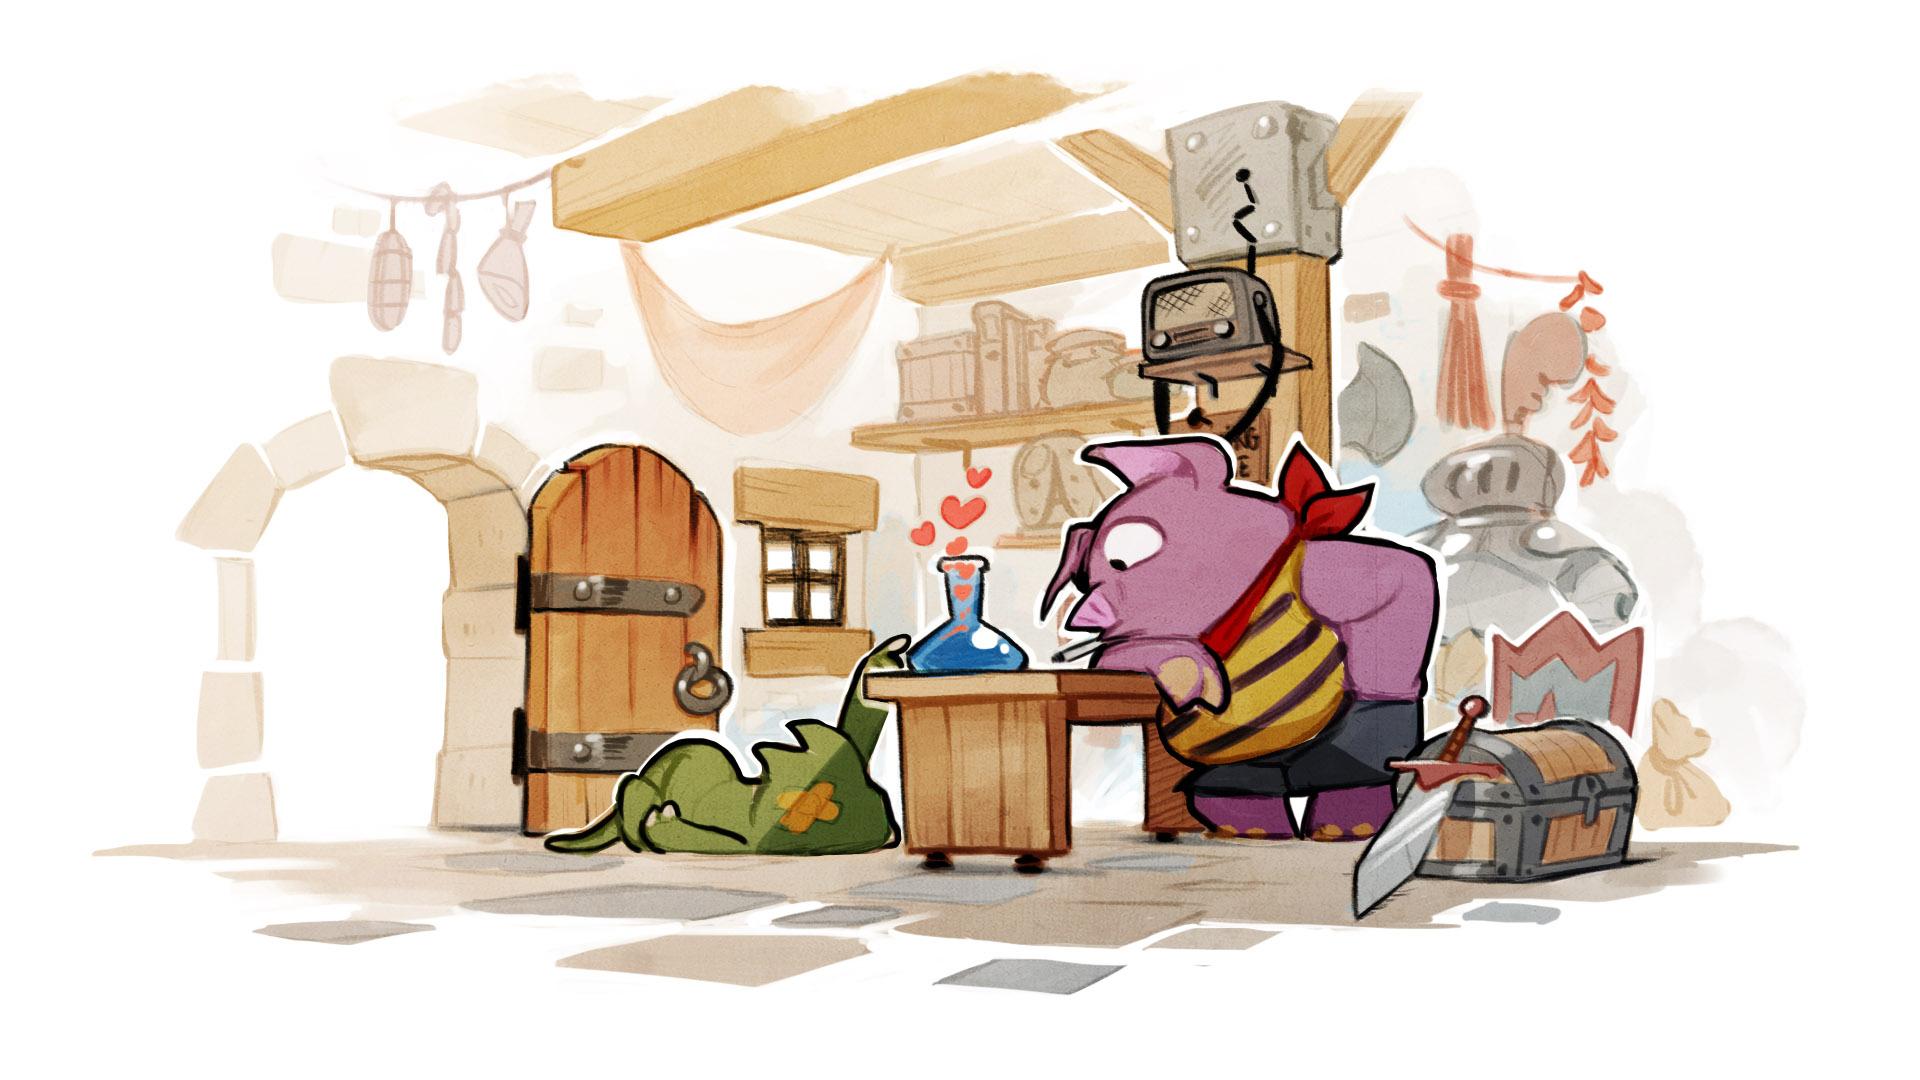 Lizard-man and pig artwork